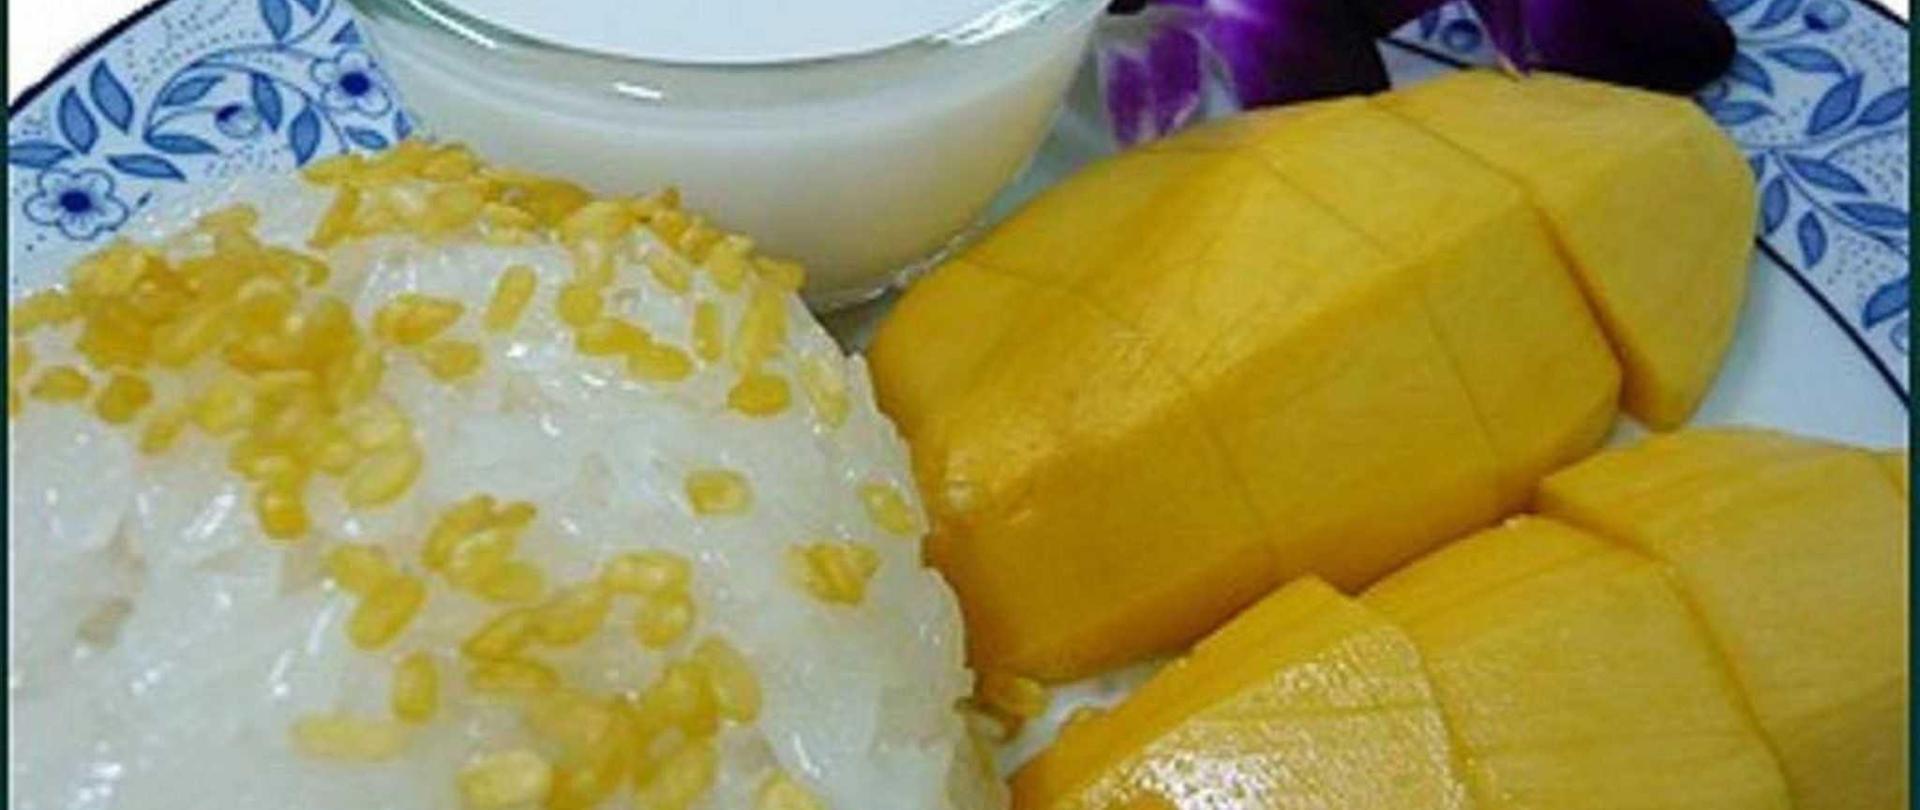 mango-sticky-rice-enlarge.jpg